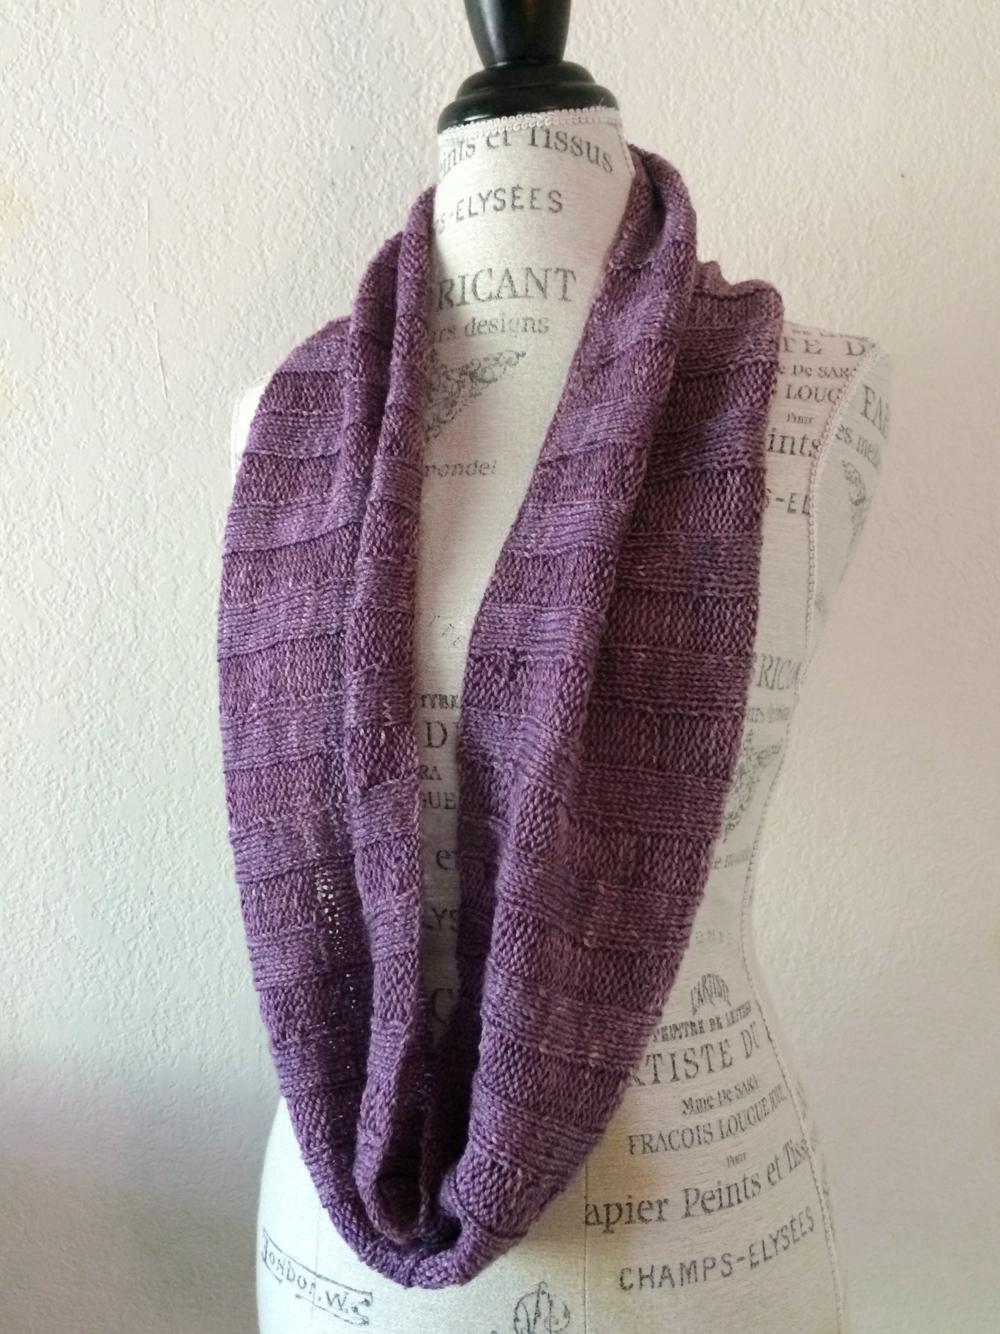 Crabapple Cowl Free Knitting Pattern | Cerramos, Labores y Puntos